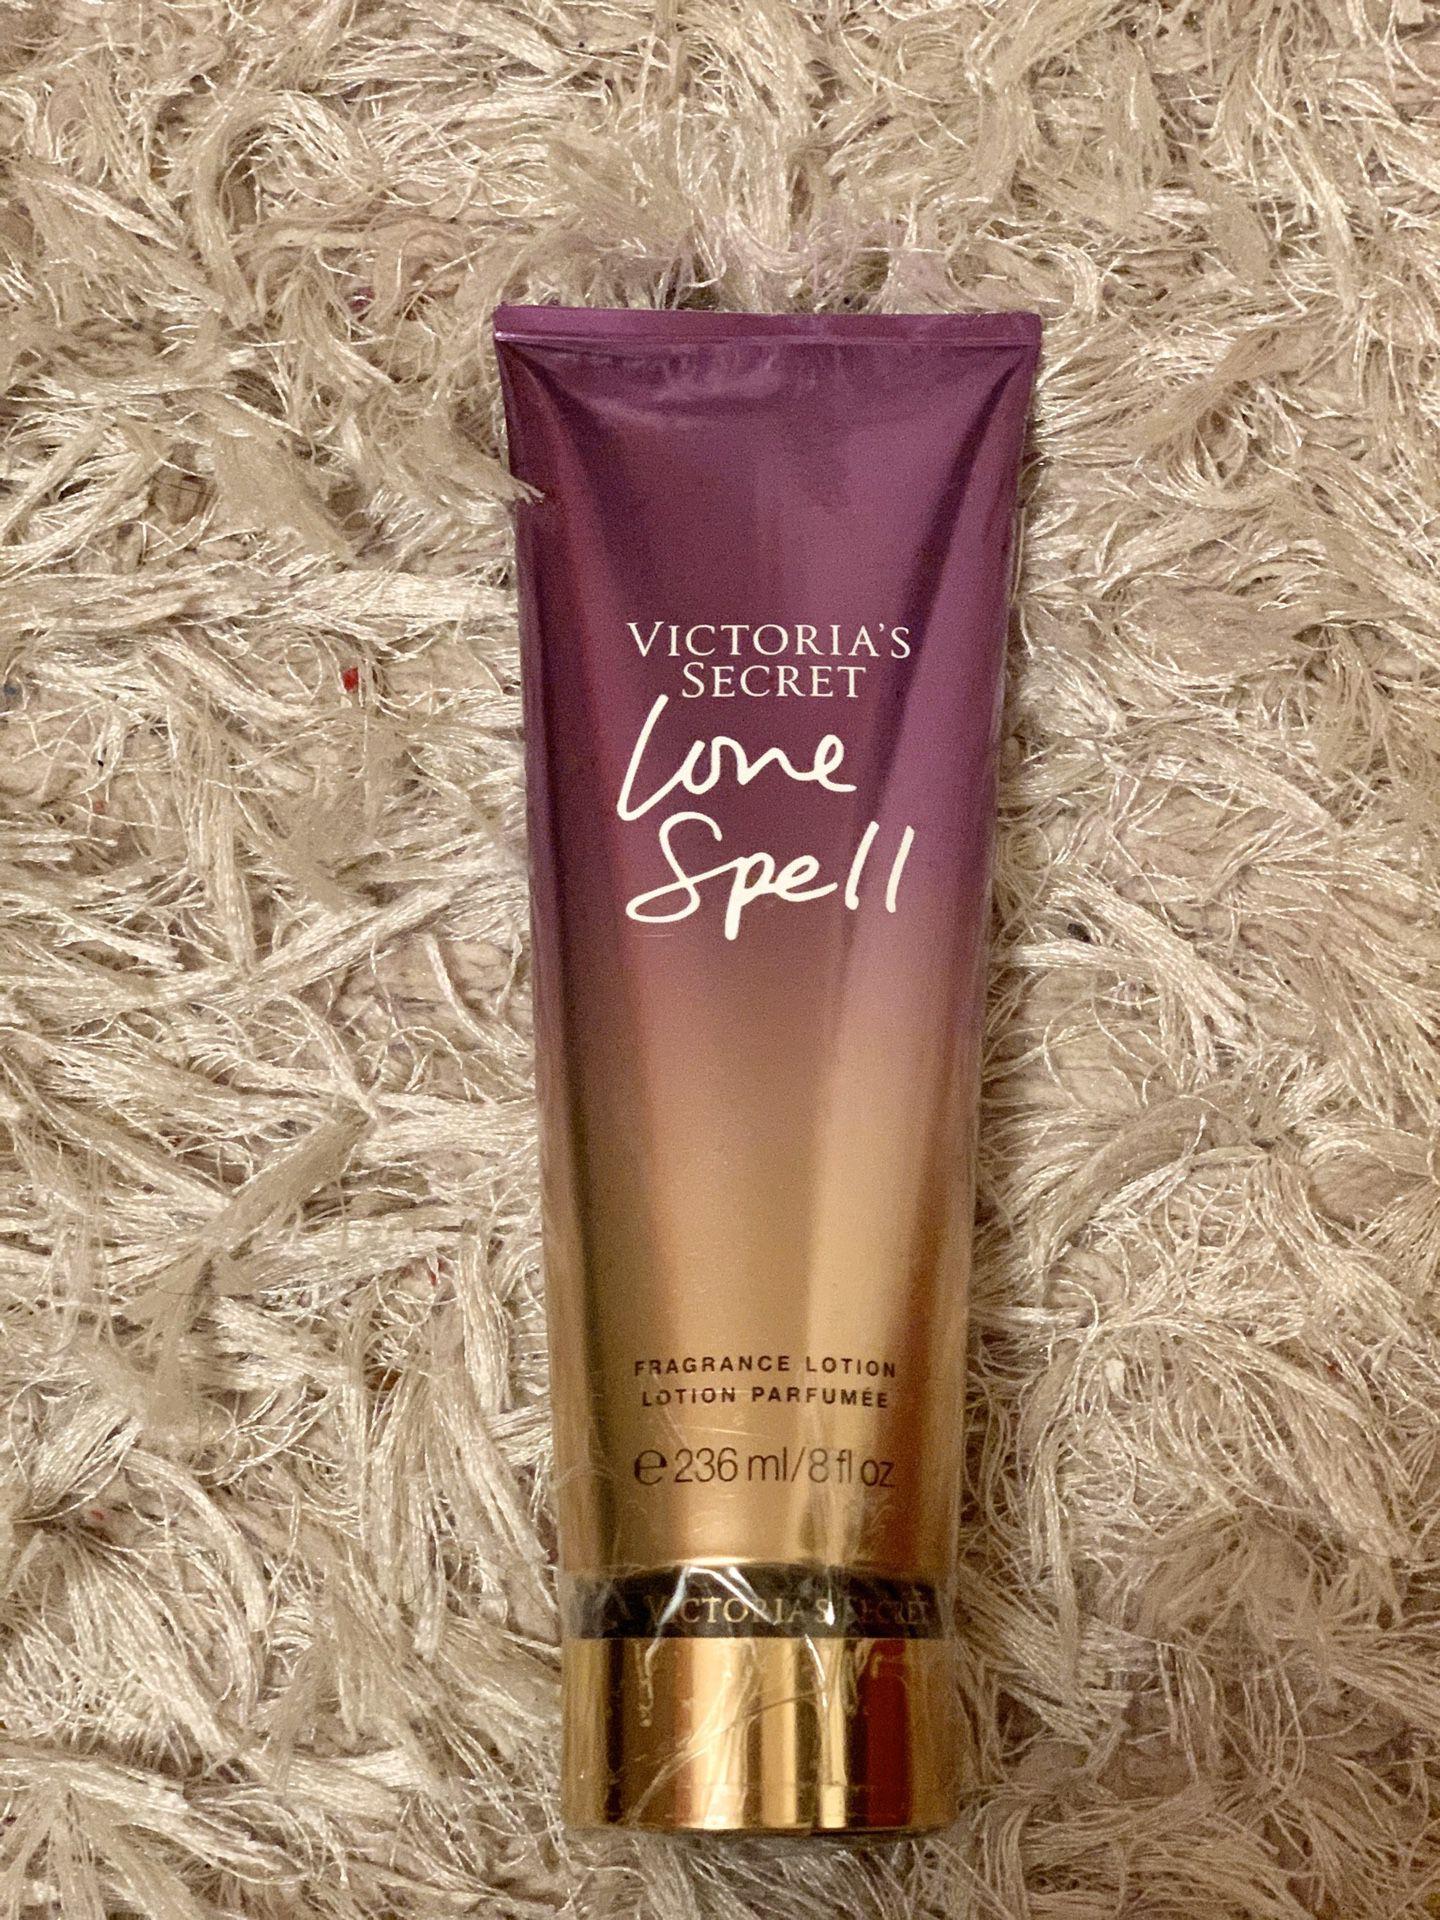 Victoria's Secret Love Spell lotion*brand new*